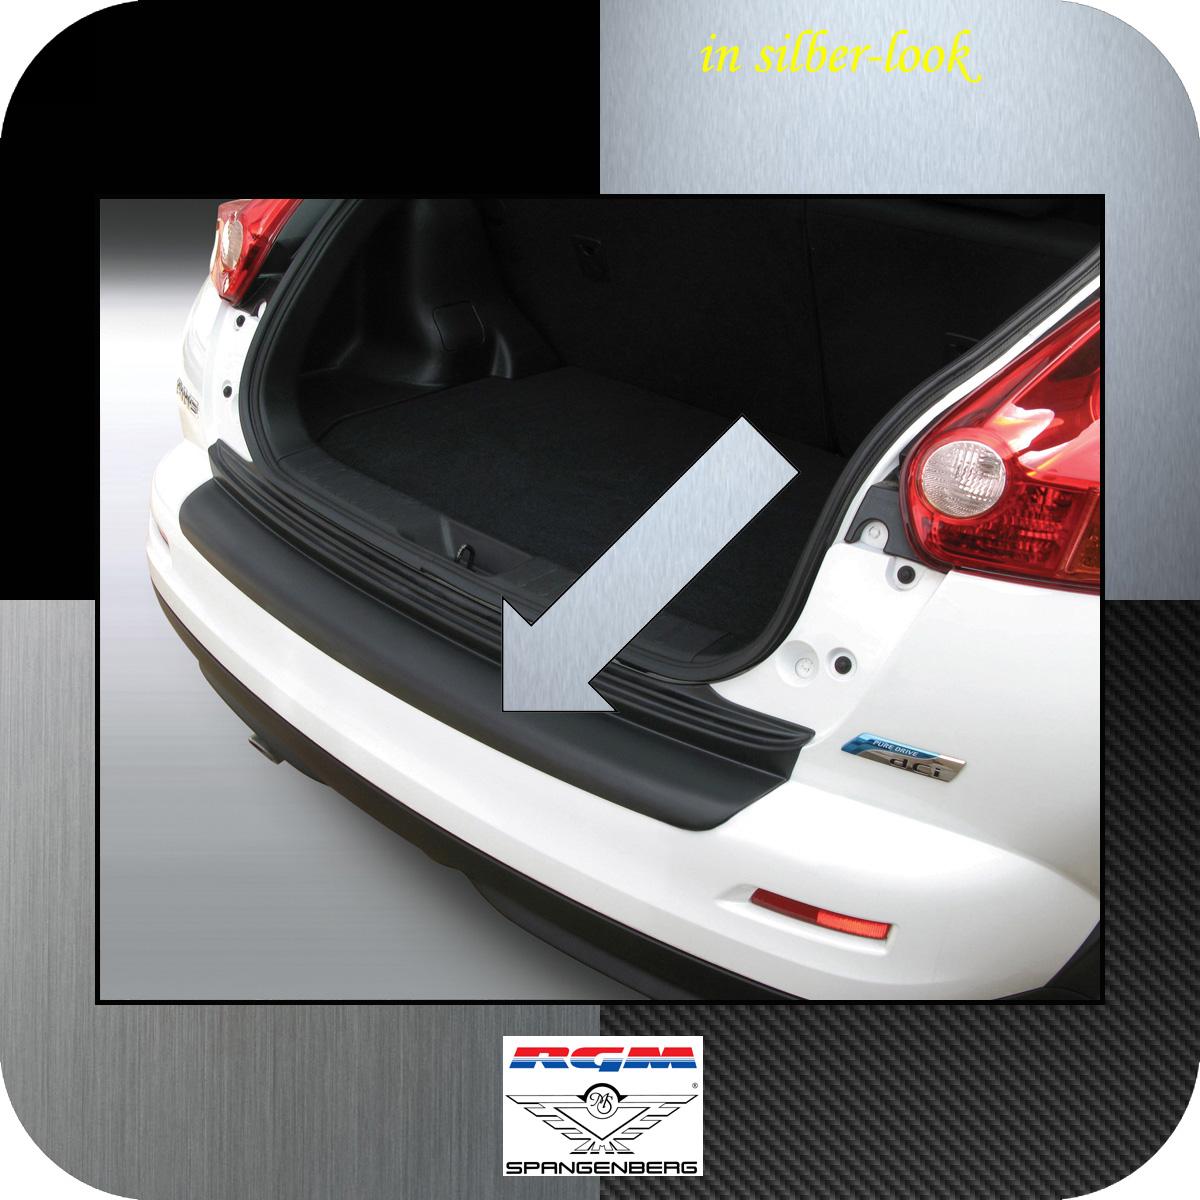 Ladekantenschutz Silber-Look Nissan Juke SUV Kombi vor facelift 2010-14 3506581